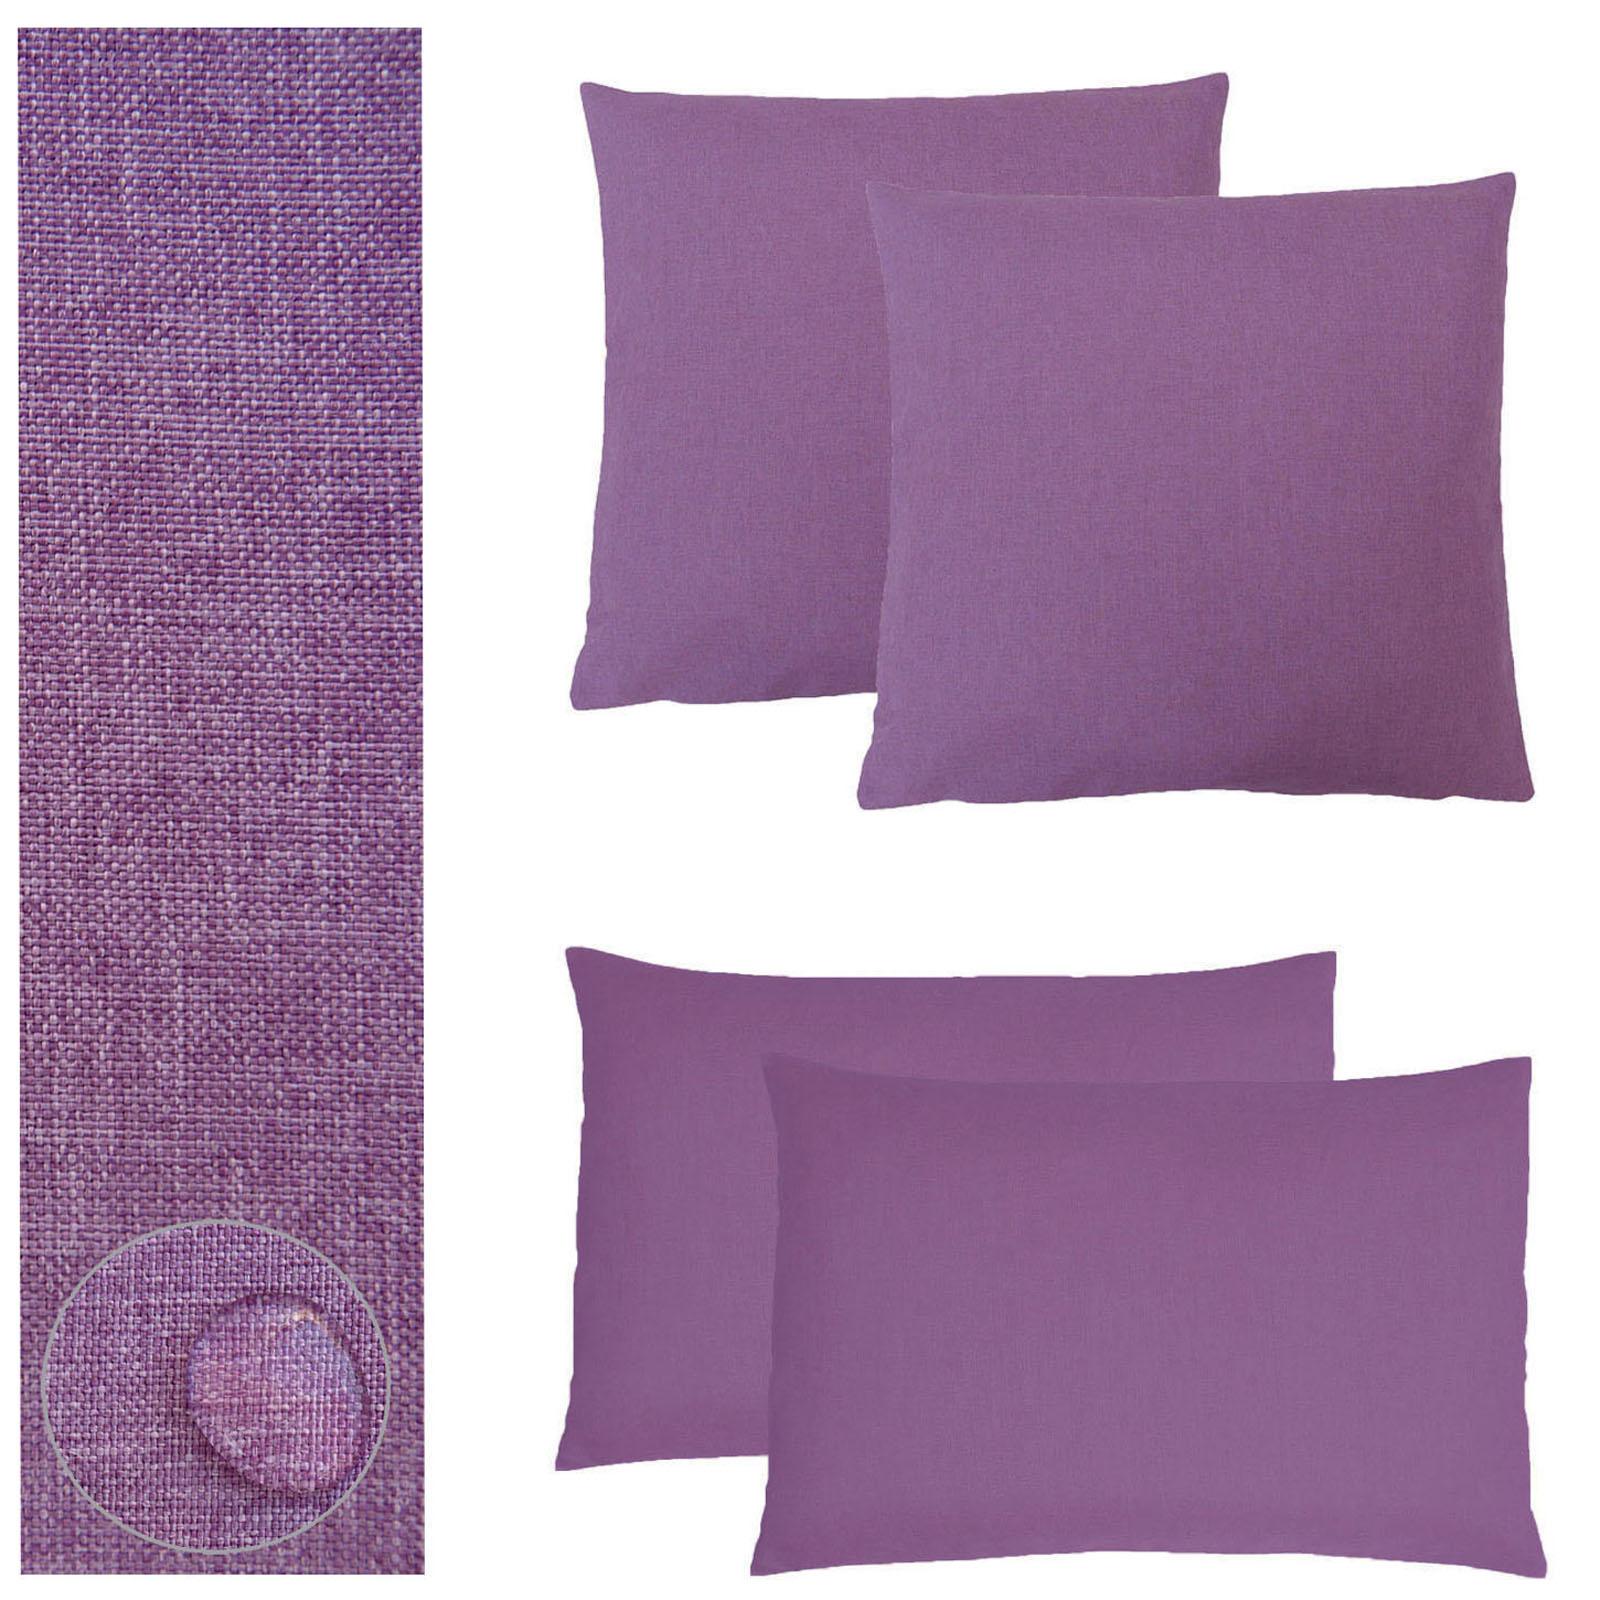 kissenh lle 2 st ck leinen optik 40x40 50x50 40x60. Black Bedroom Furniture Sets. Home Design Ideas